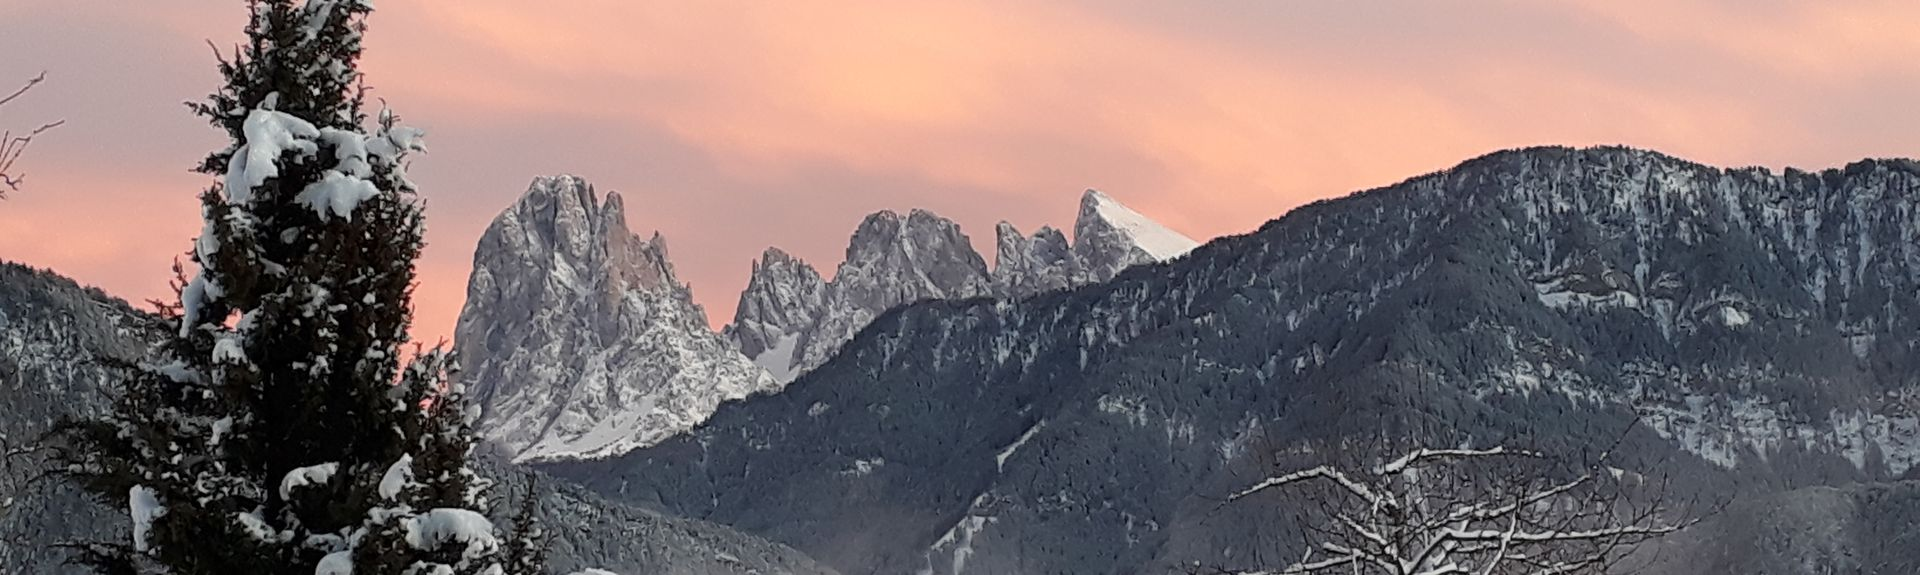 Lajen, Trentino-Alto Adige, Itália